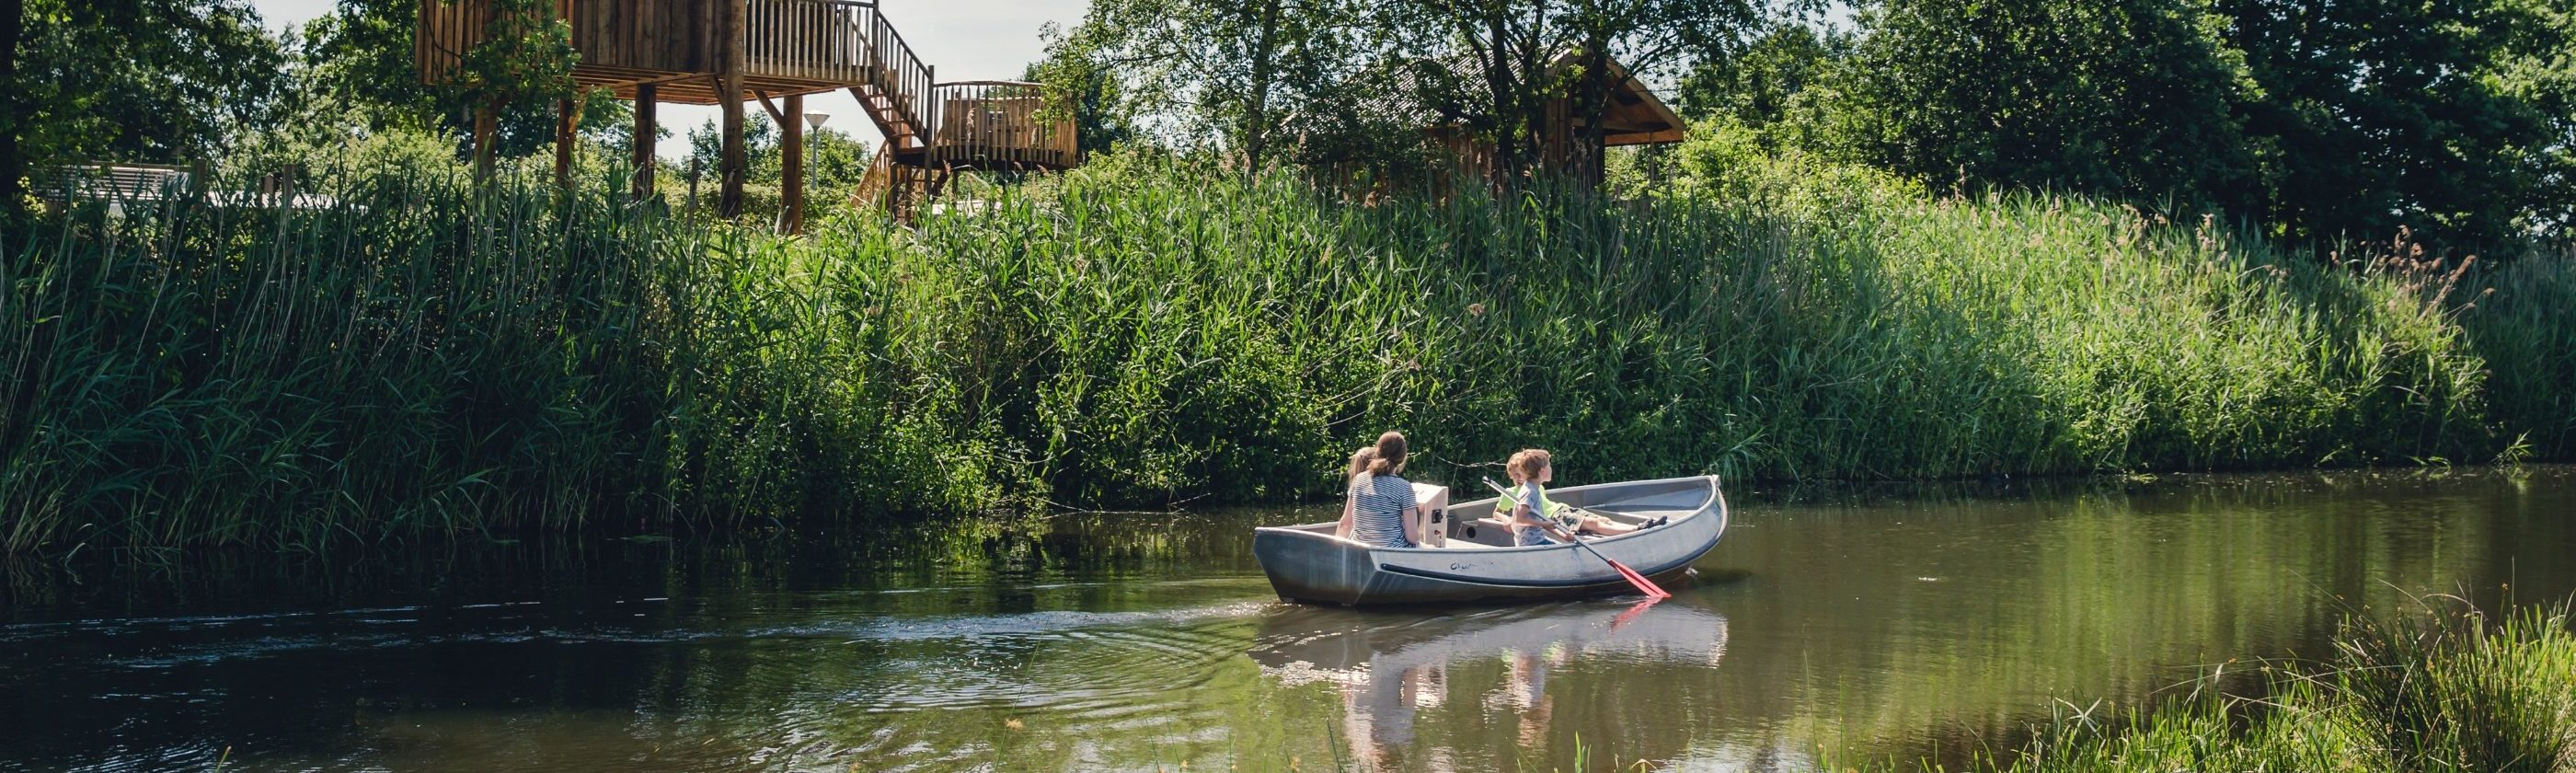 Varen over vakantiepark Mölke - Kids-Campings